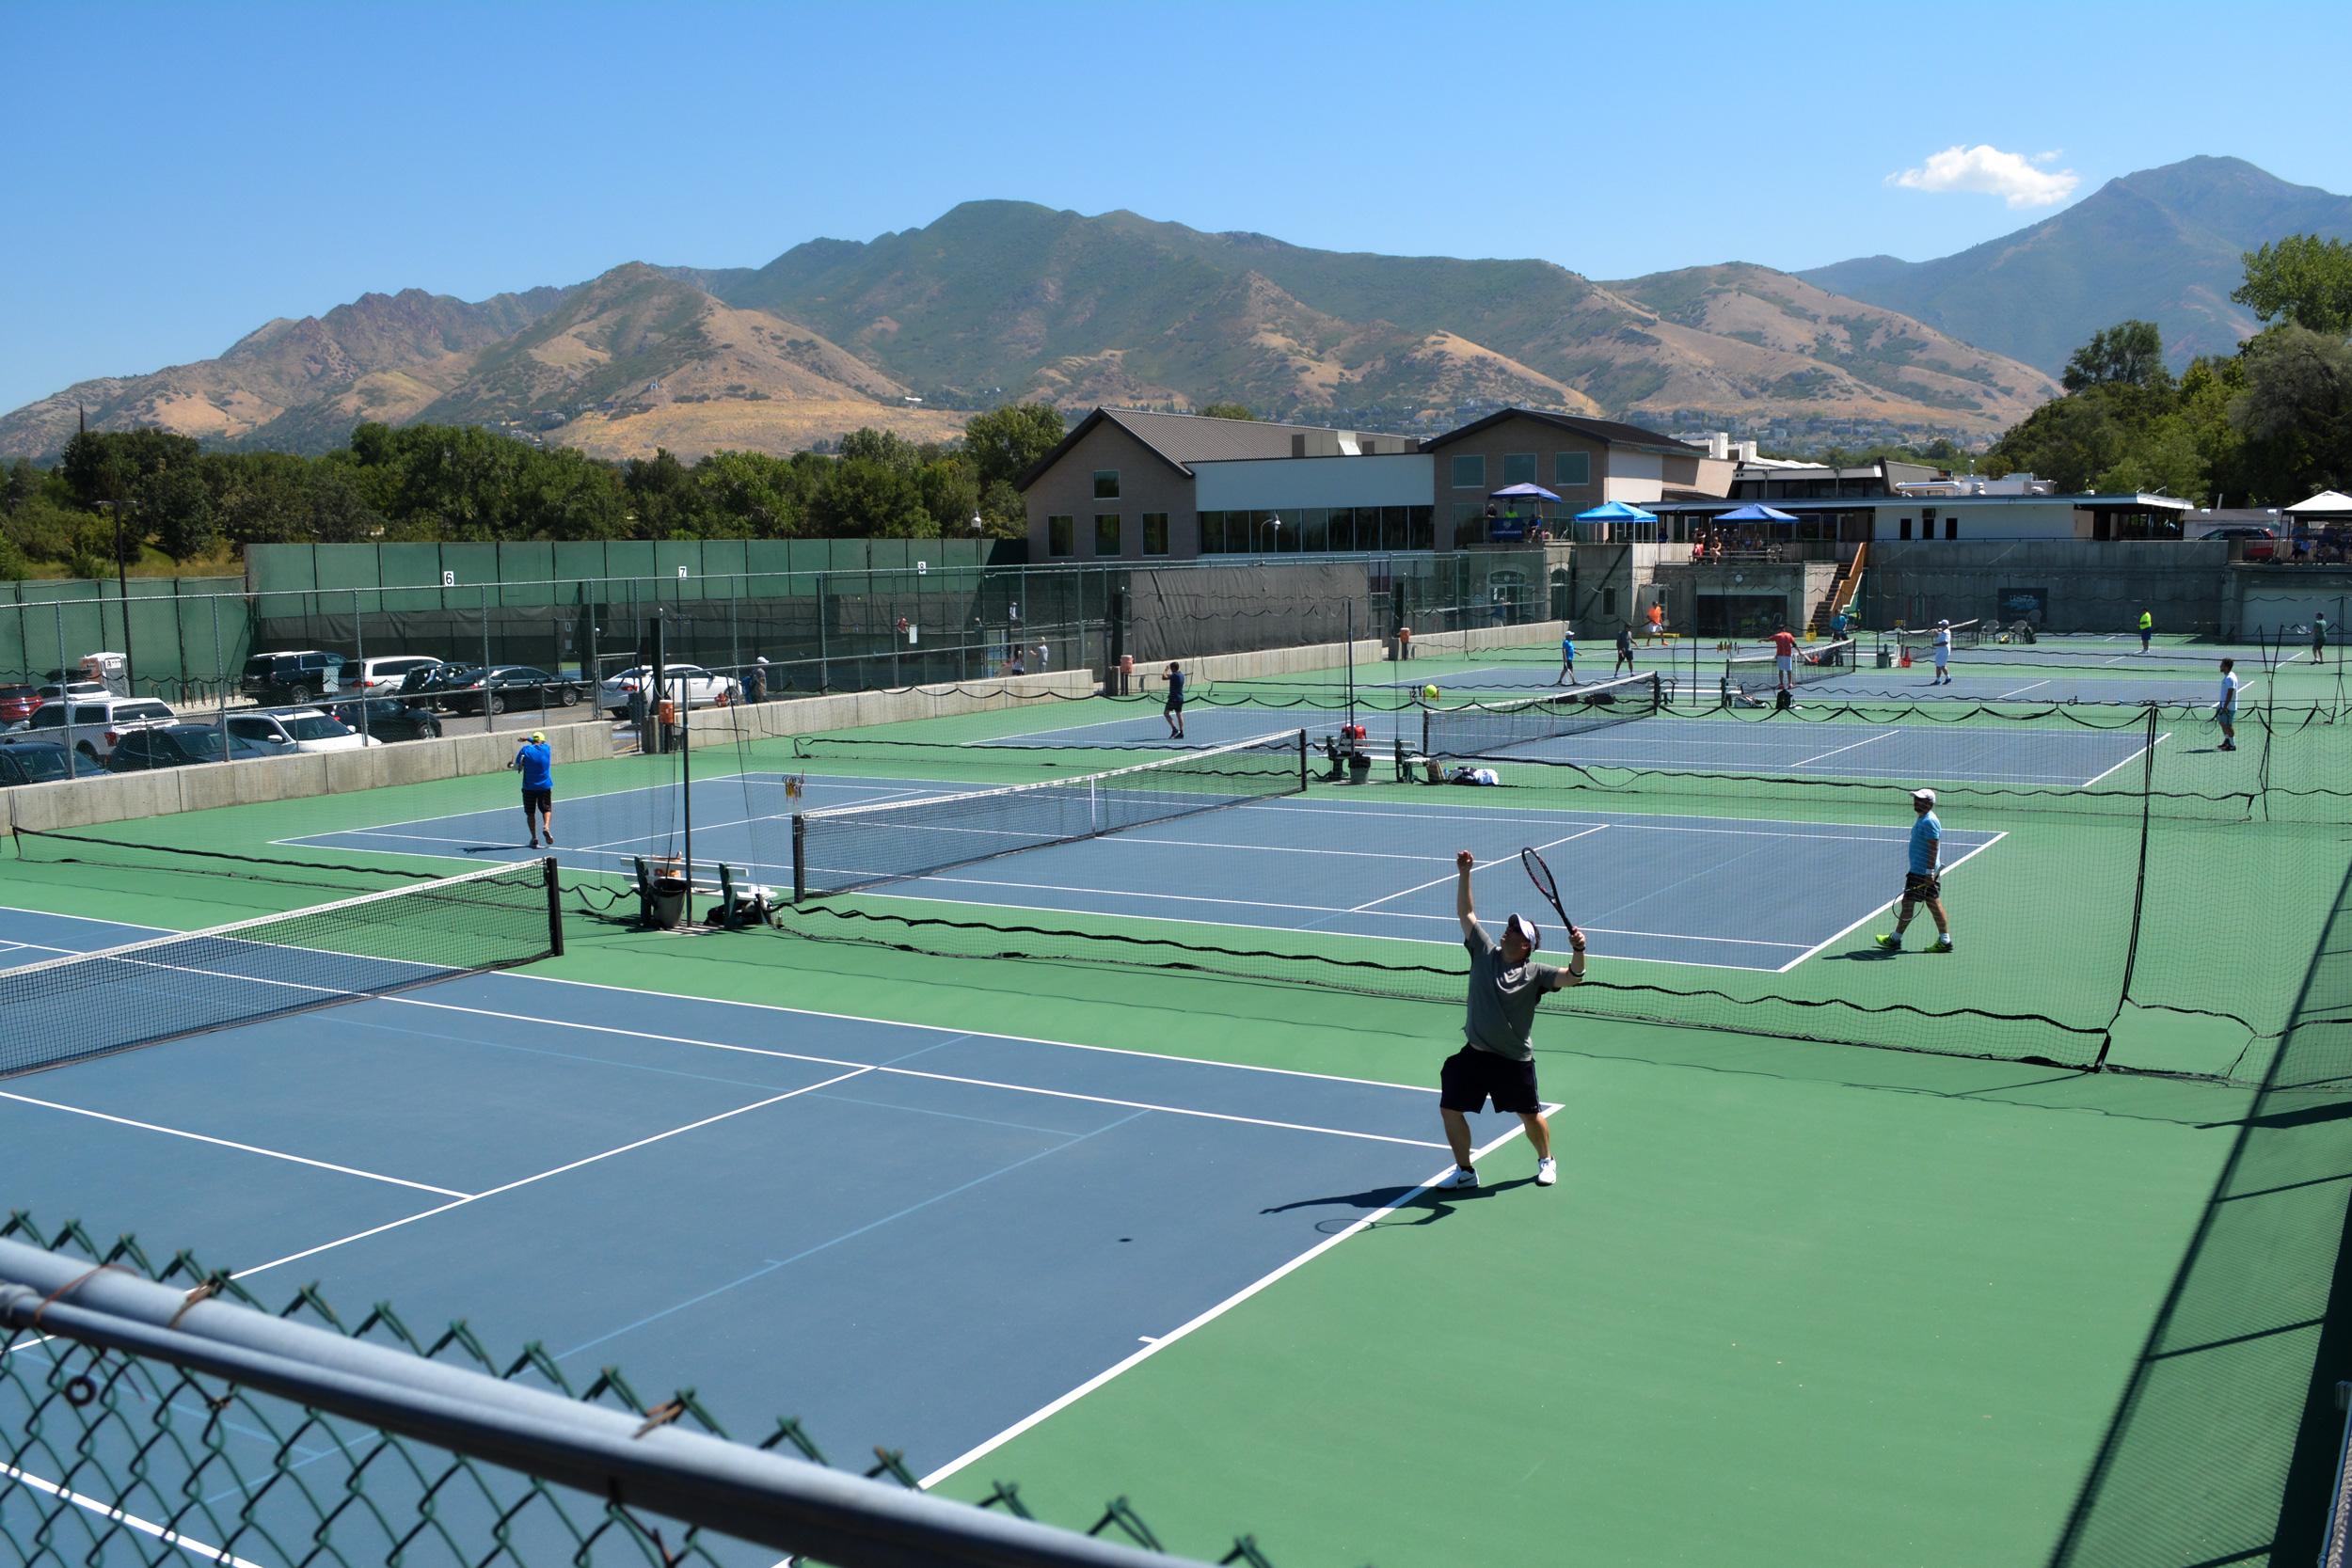 Tournament tennis play at the Salt Lake Tennis and Health Club